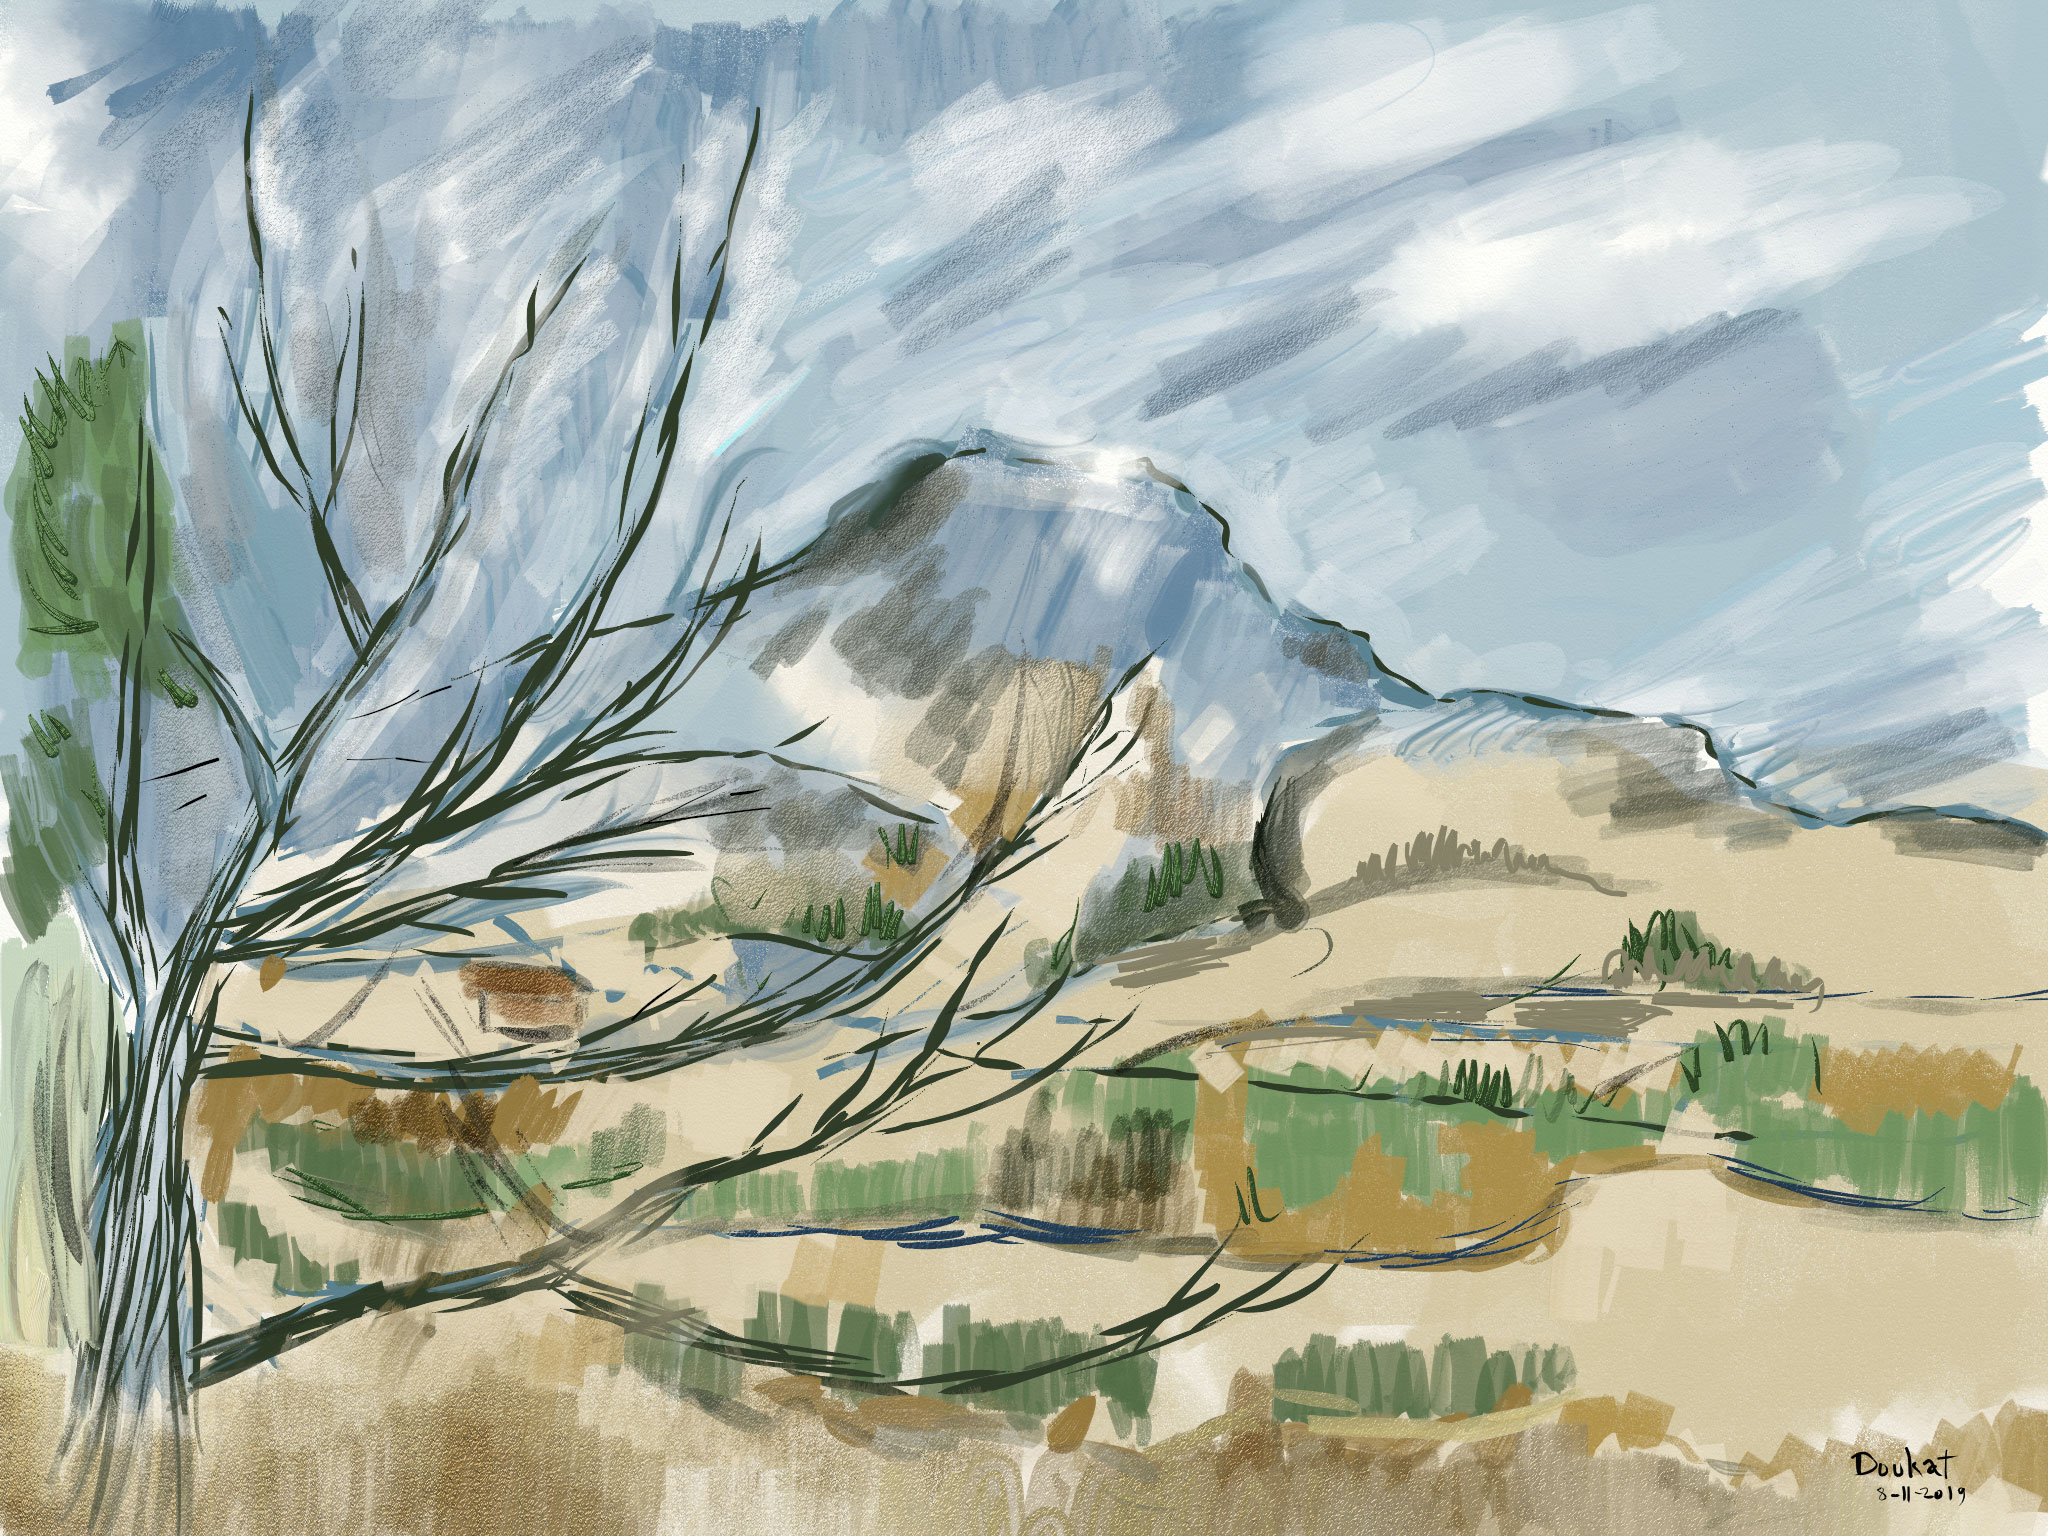 Cezanne-Mount-blog.jpg, Paul Cézanne, Mount Sainte-Victoire, Artrage, iPad Pro